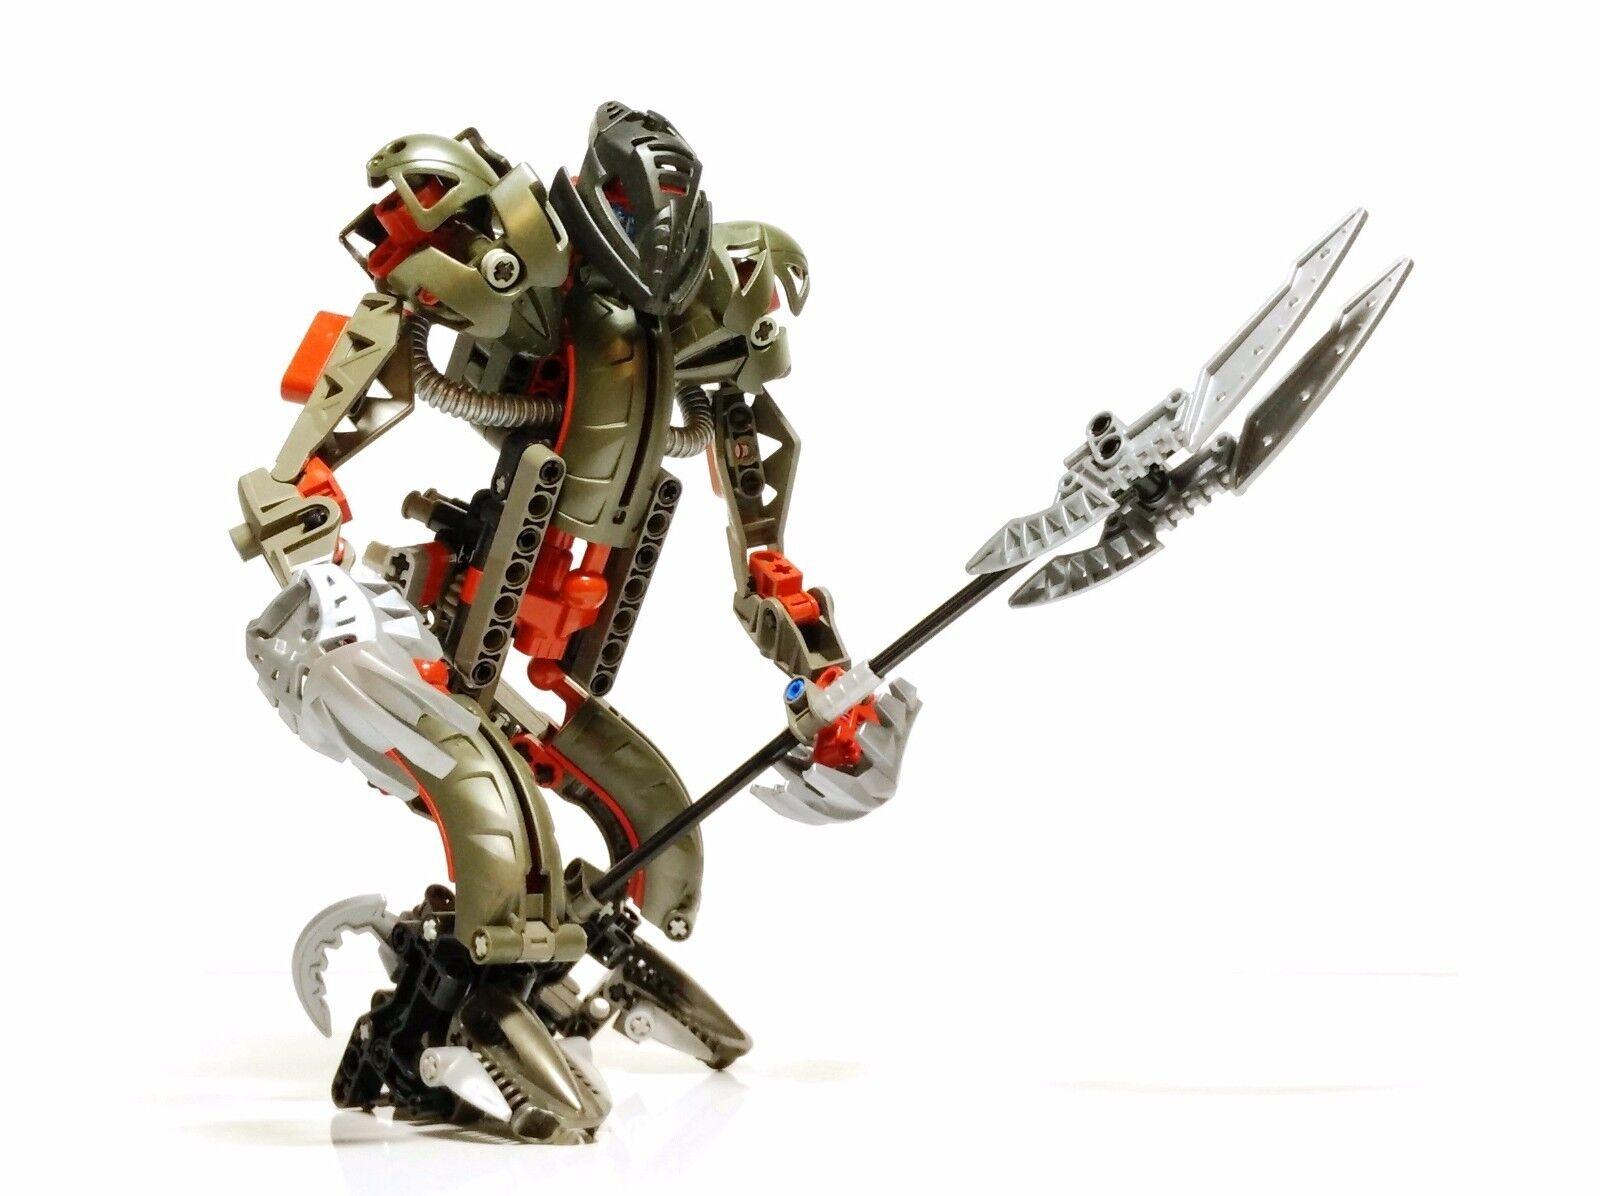 Лего Биониклы (Bionicle) - каталог наборов с инструкциями 38